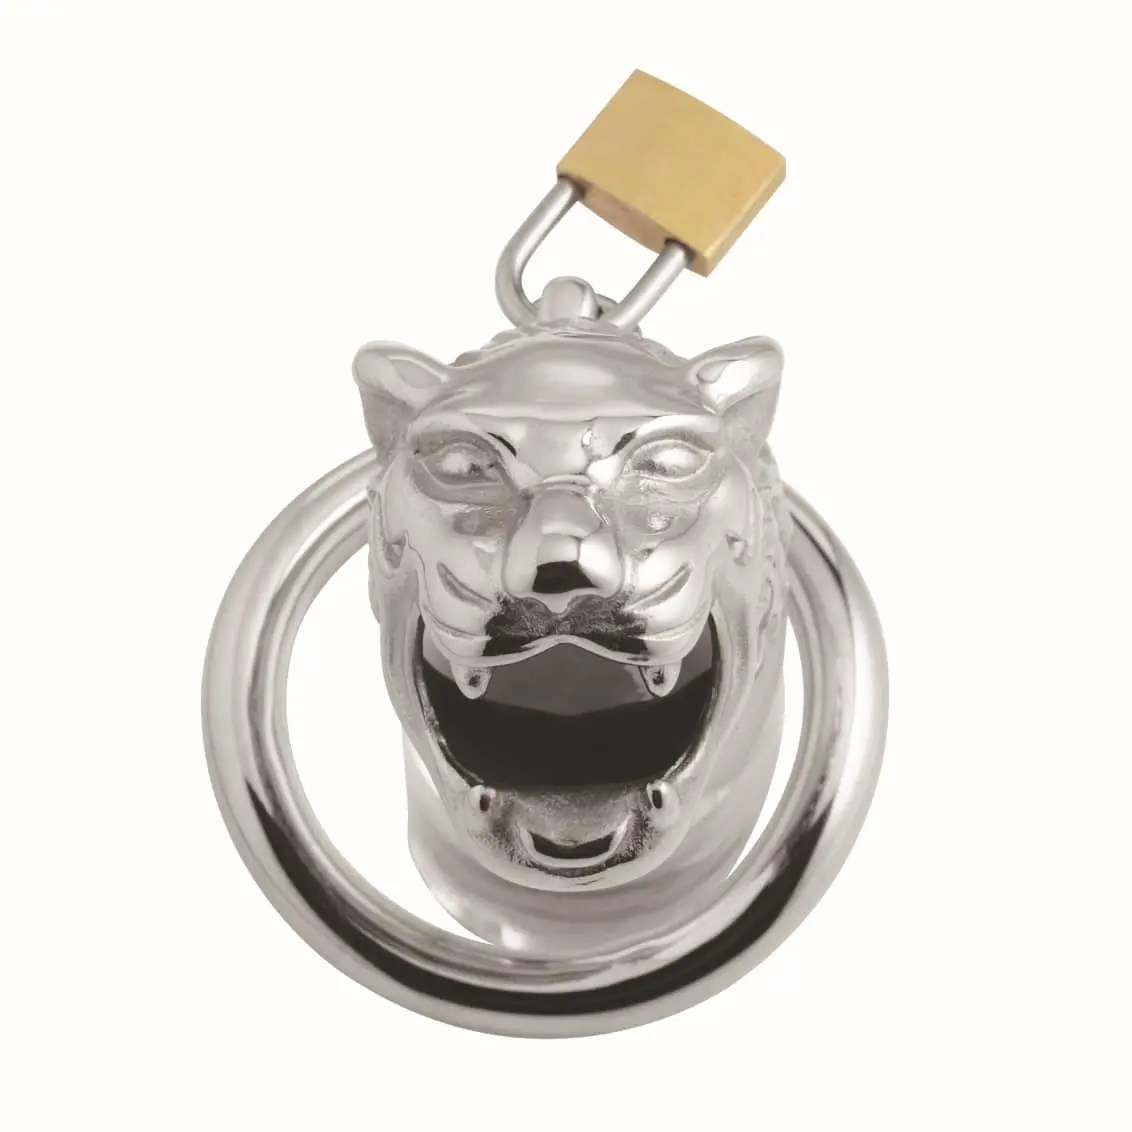 Master Series – Tiger King Locking Chastity Cage